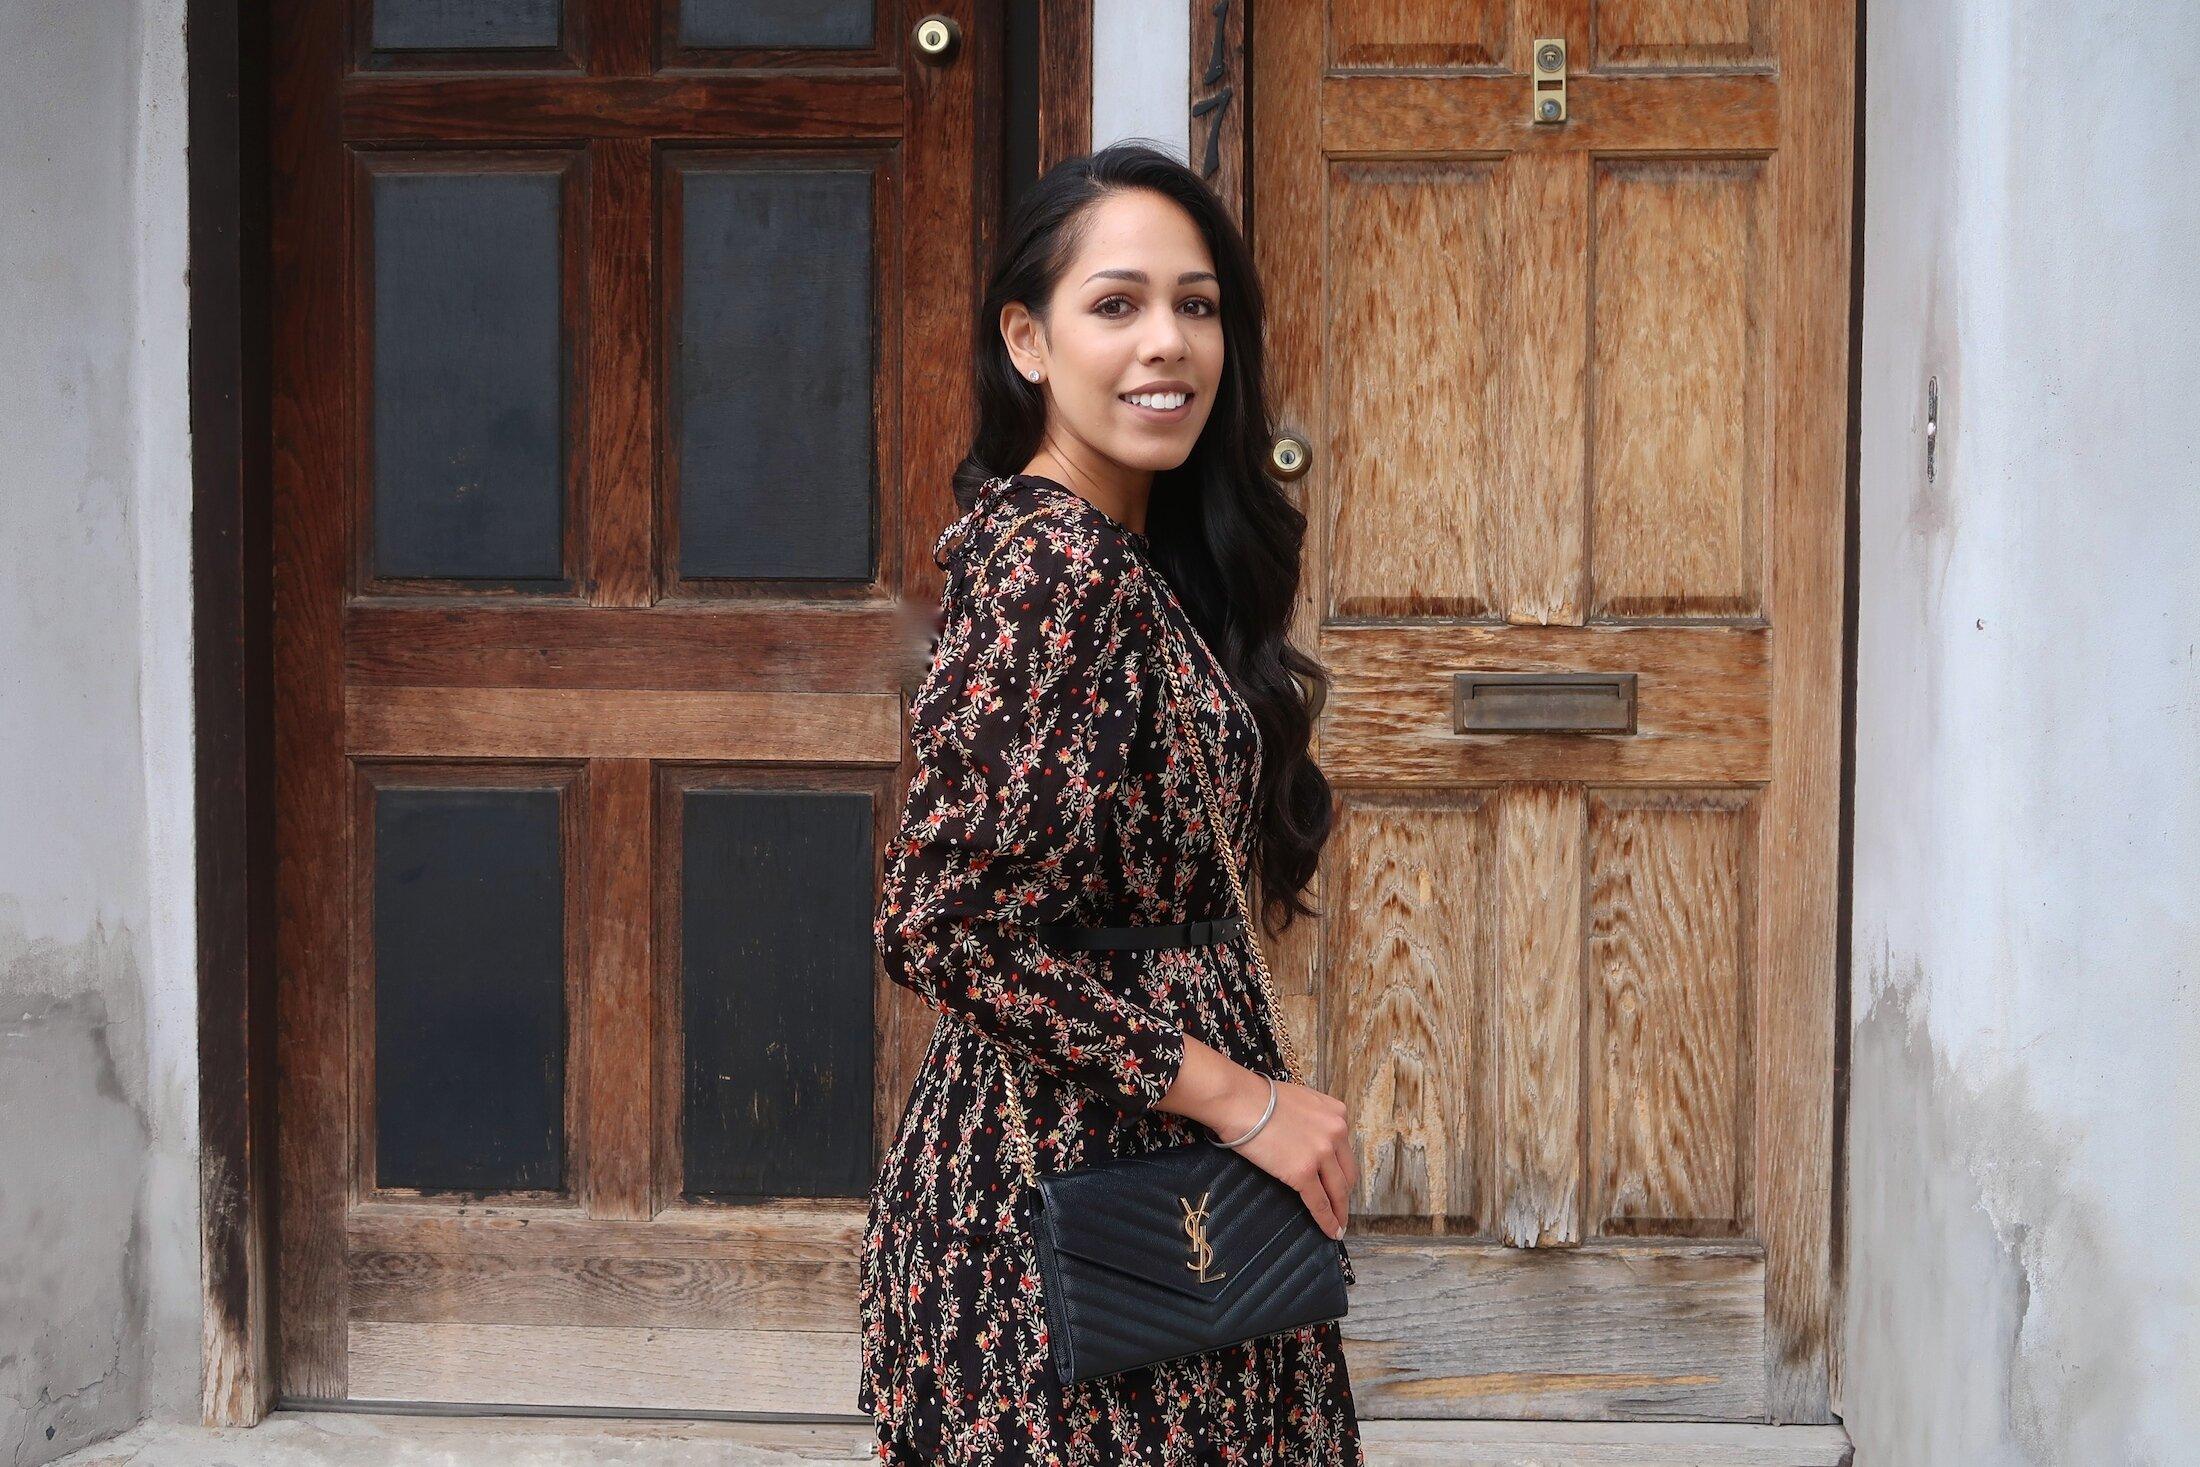 fall-outfits-Philadelphia-fashion-blogger.JPG